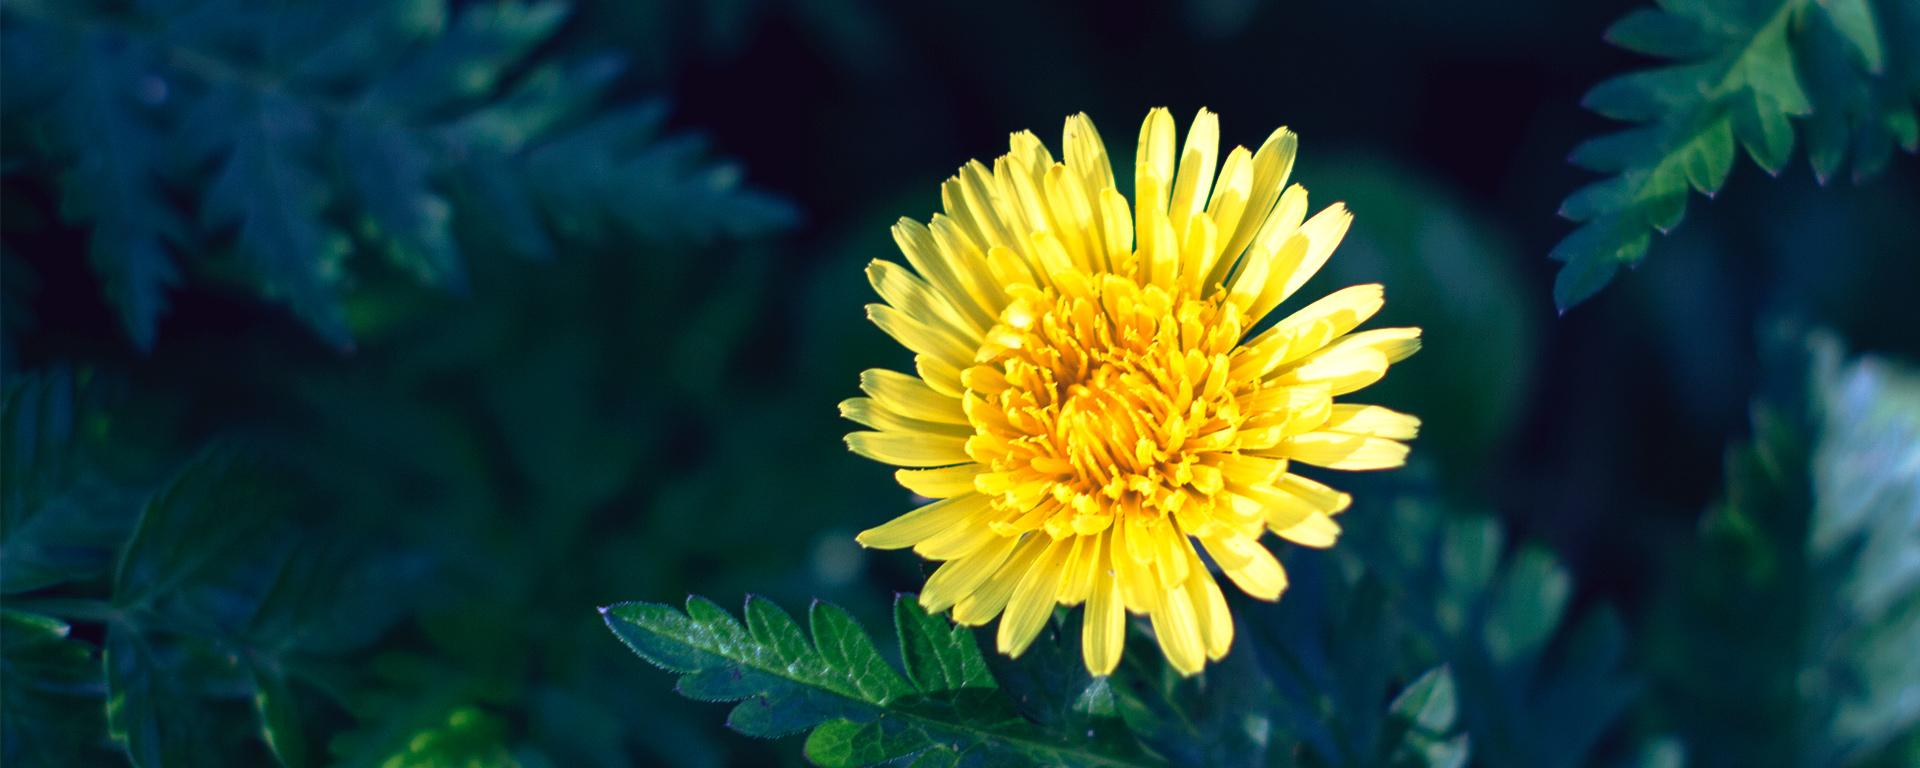 Little Yellow Sun Flower from The Netherlands